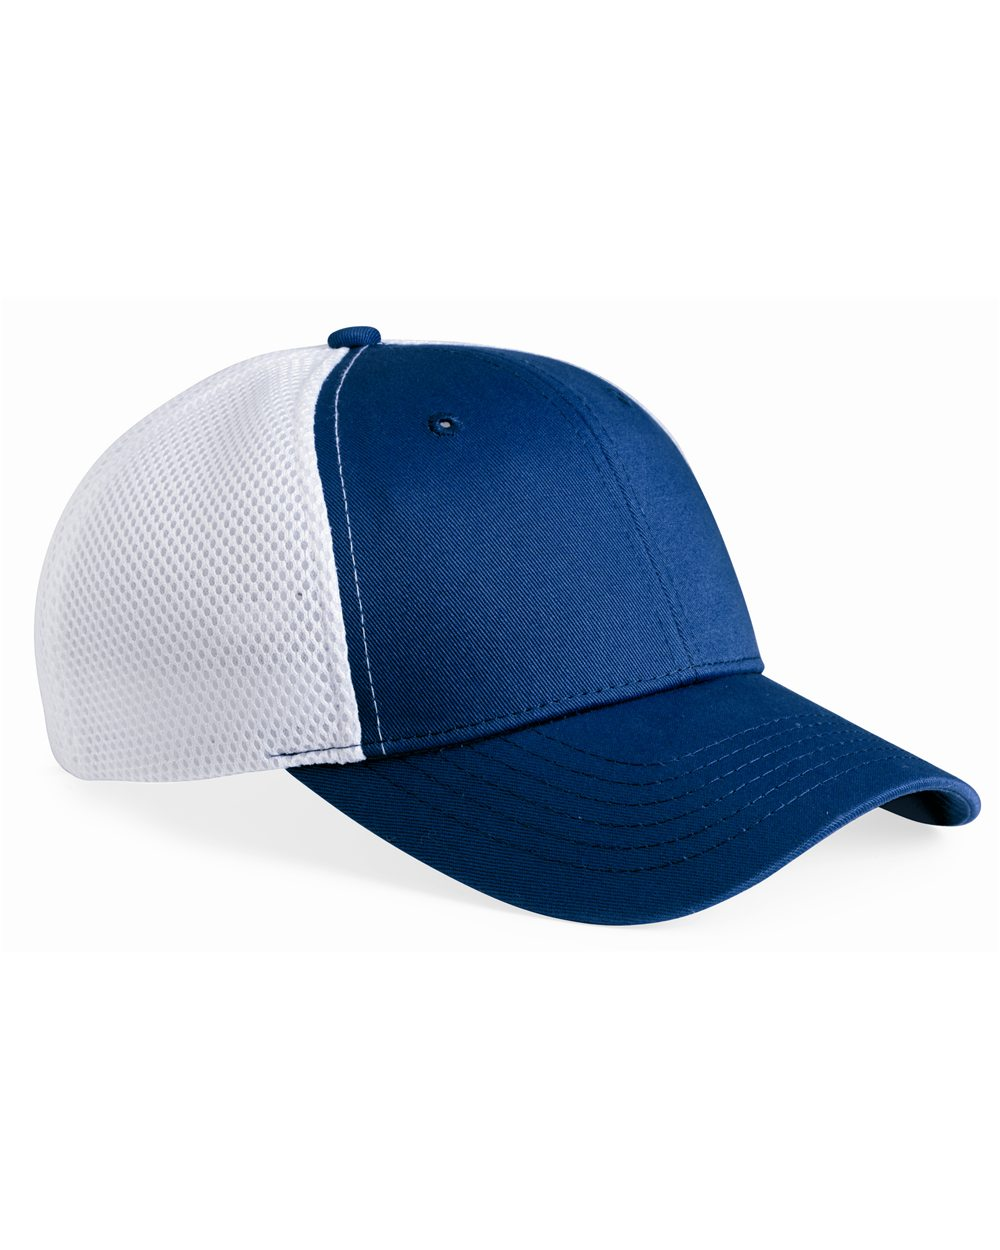 Sportsman 3200 - Spacer Mesh Back Cap